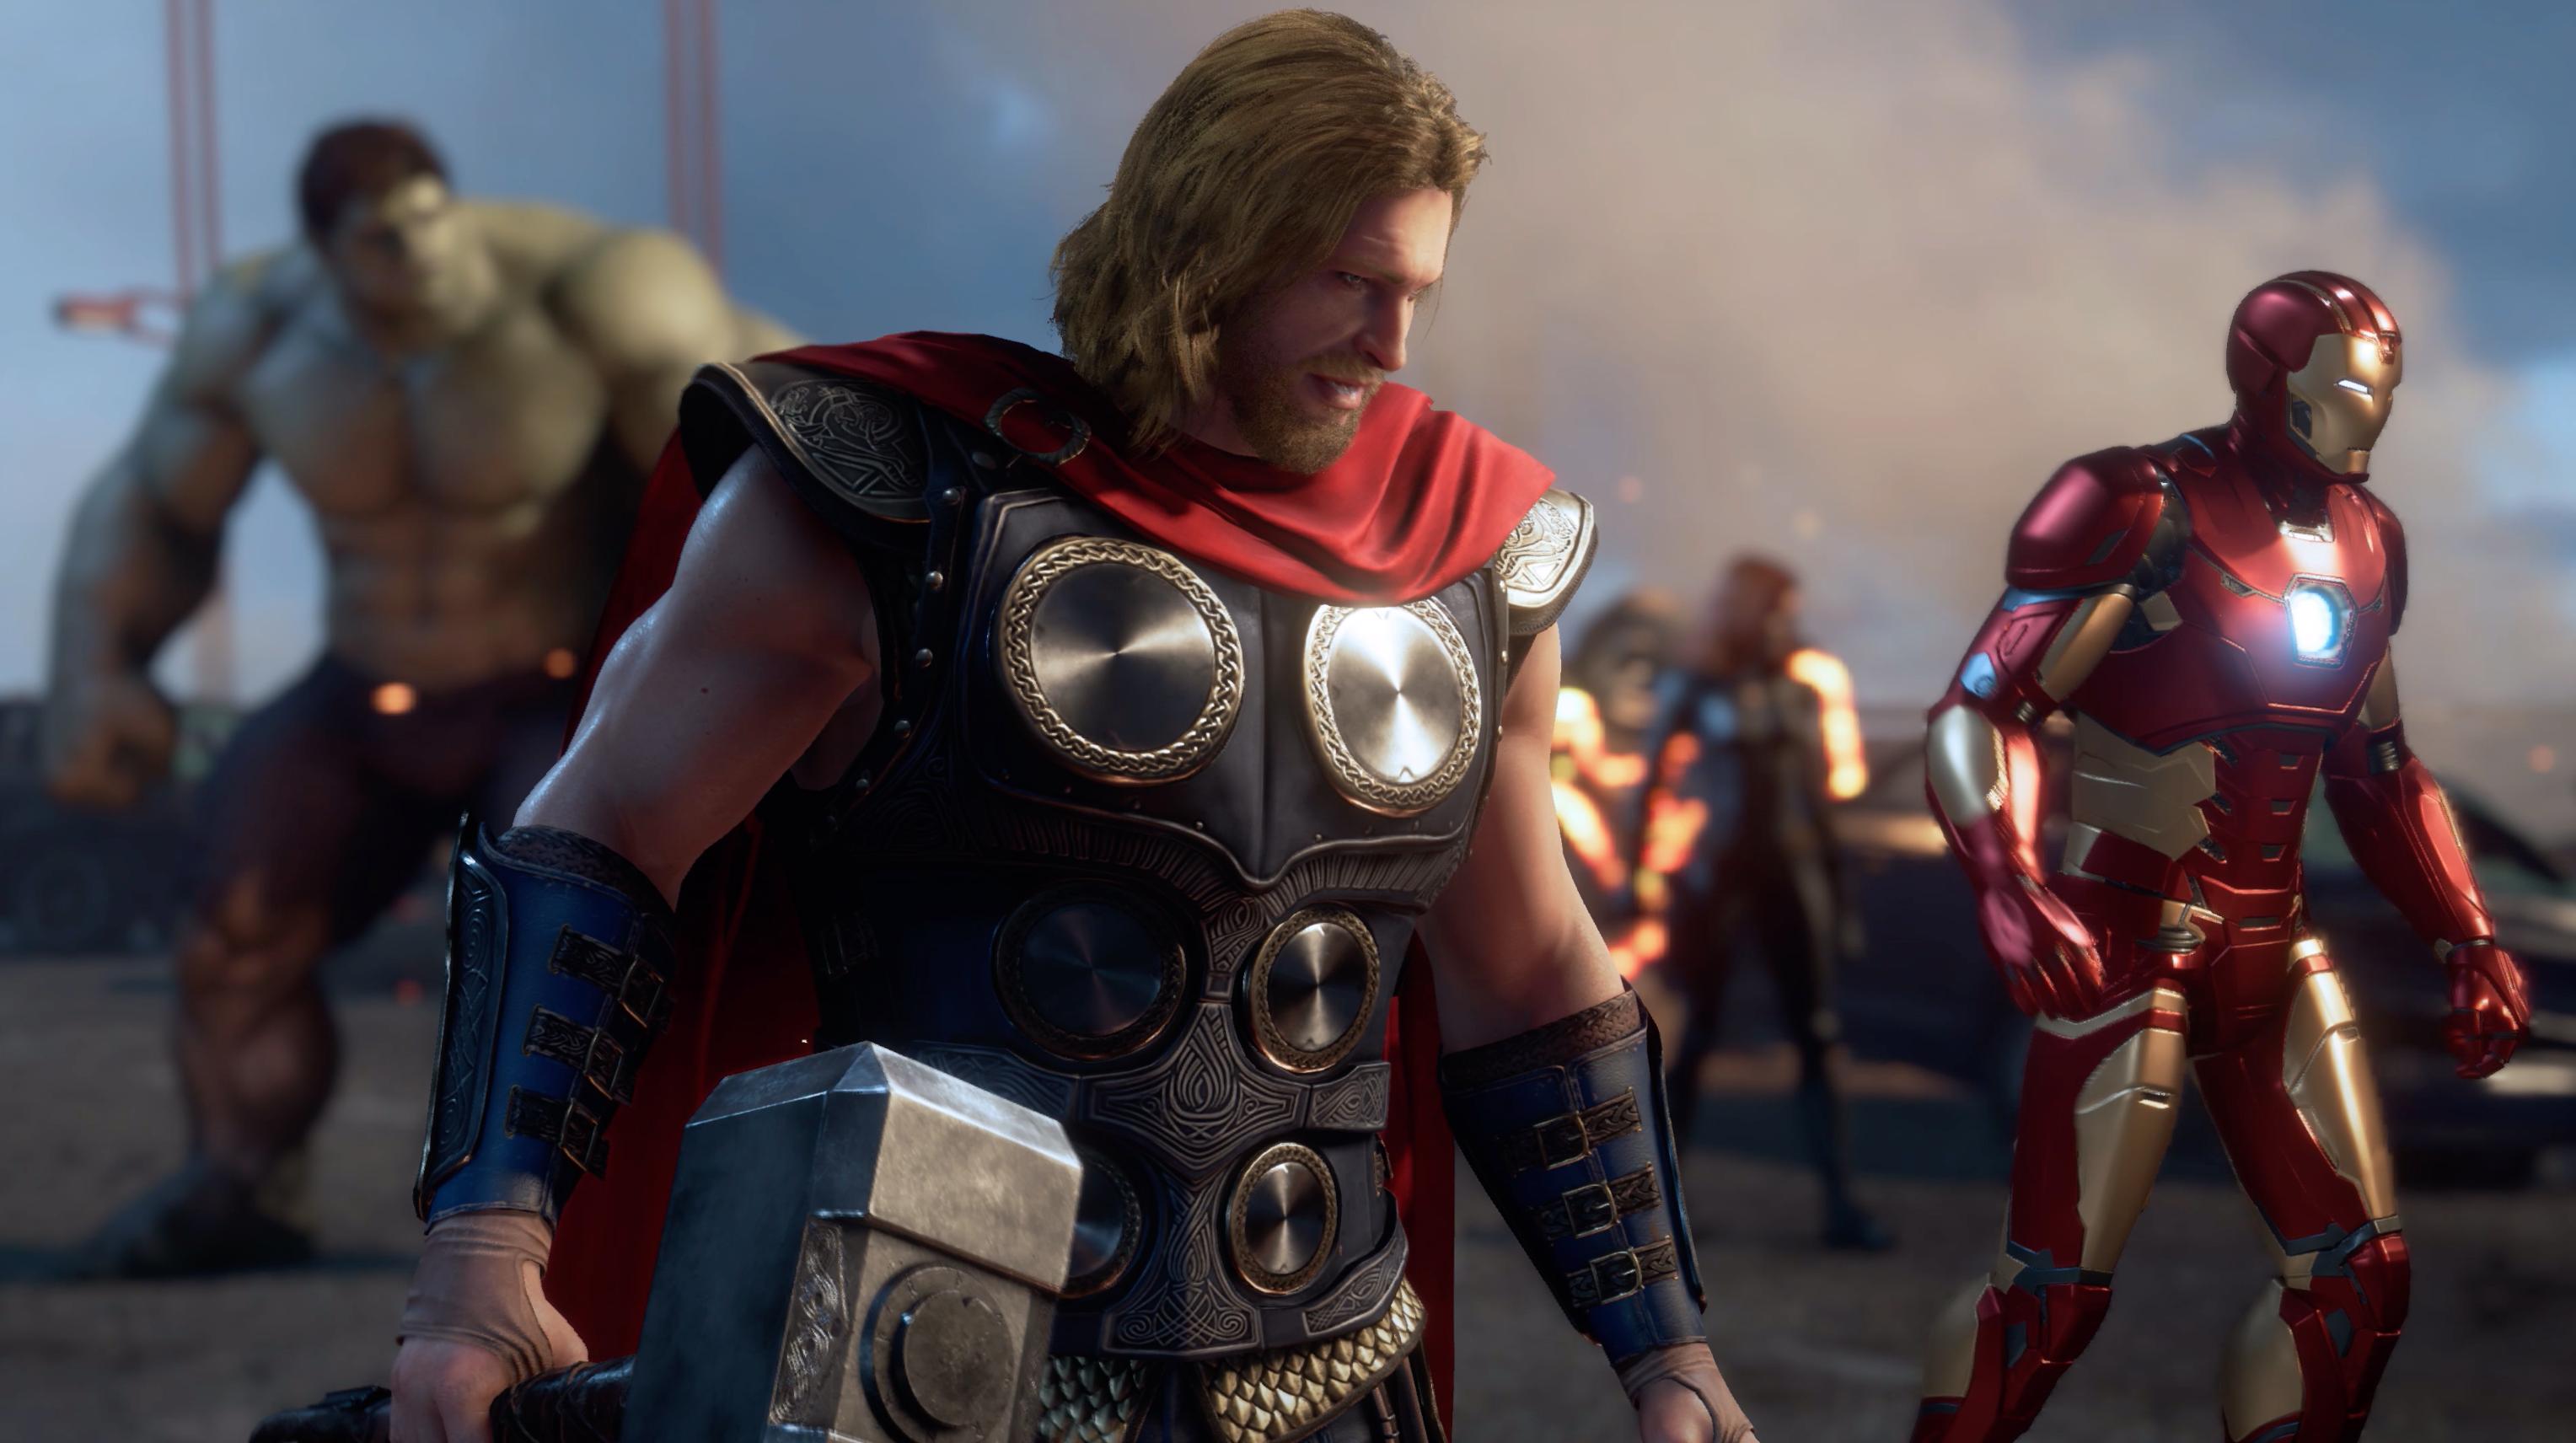 Photo of مزيد من التفاصيل التي تخص لعبة Marvel's Avengers من المقرر الكشف عنها خلال حدث Comic-Con 2019 .